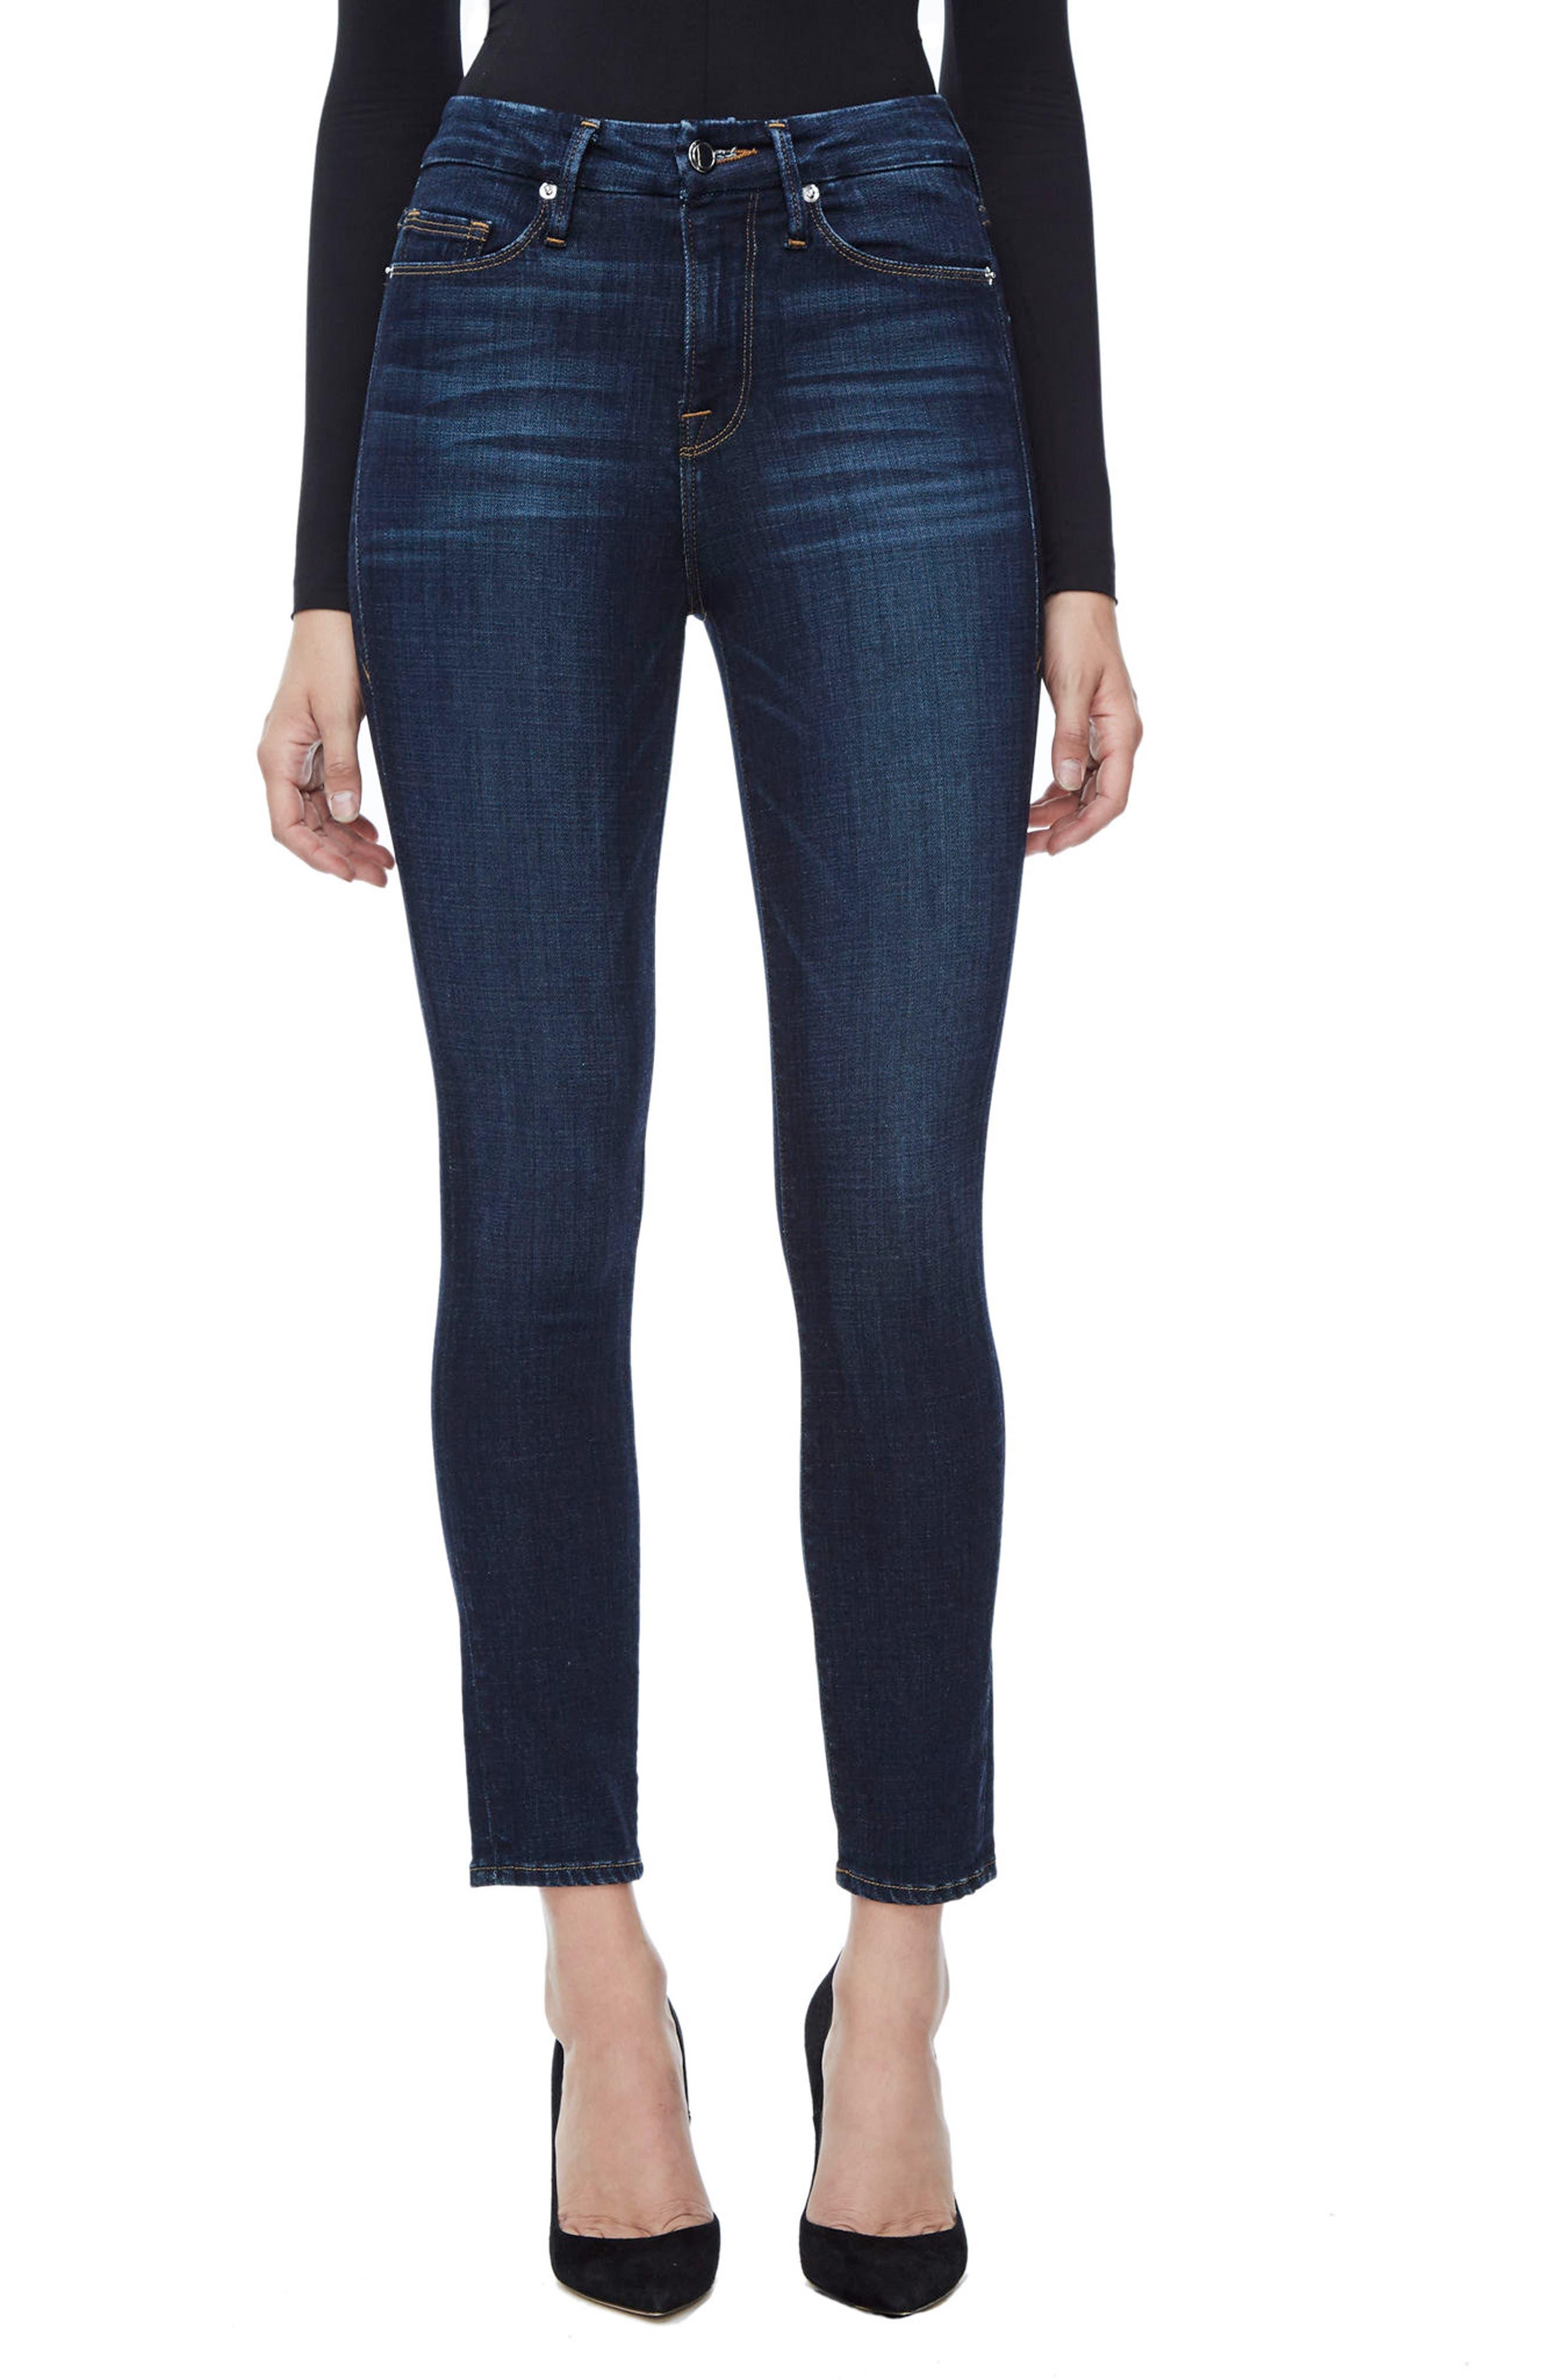 Alternate Image 1 Selected - Good American Good Legs High Waist Ankle Skinny Jeans (Blue 089) (Regular & Plus Size)